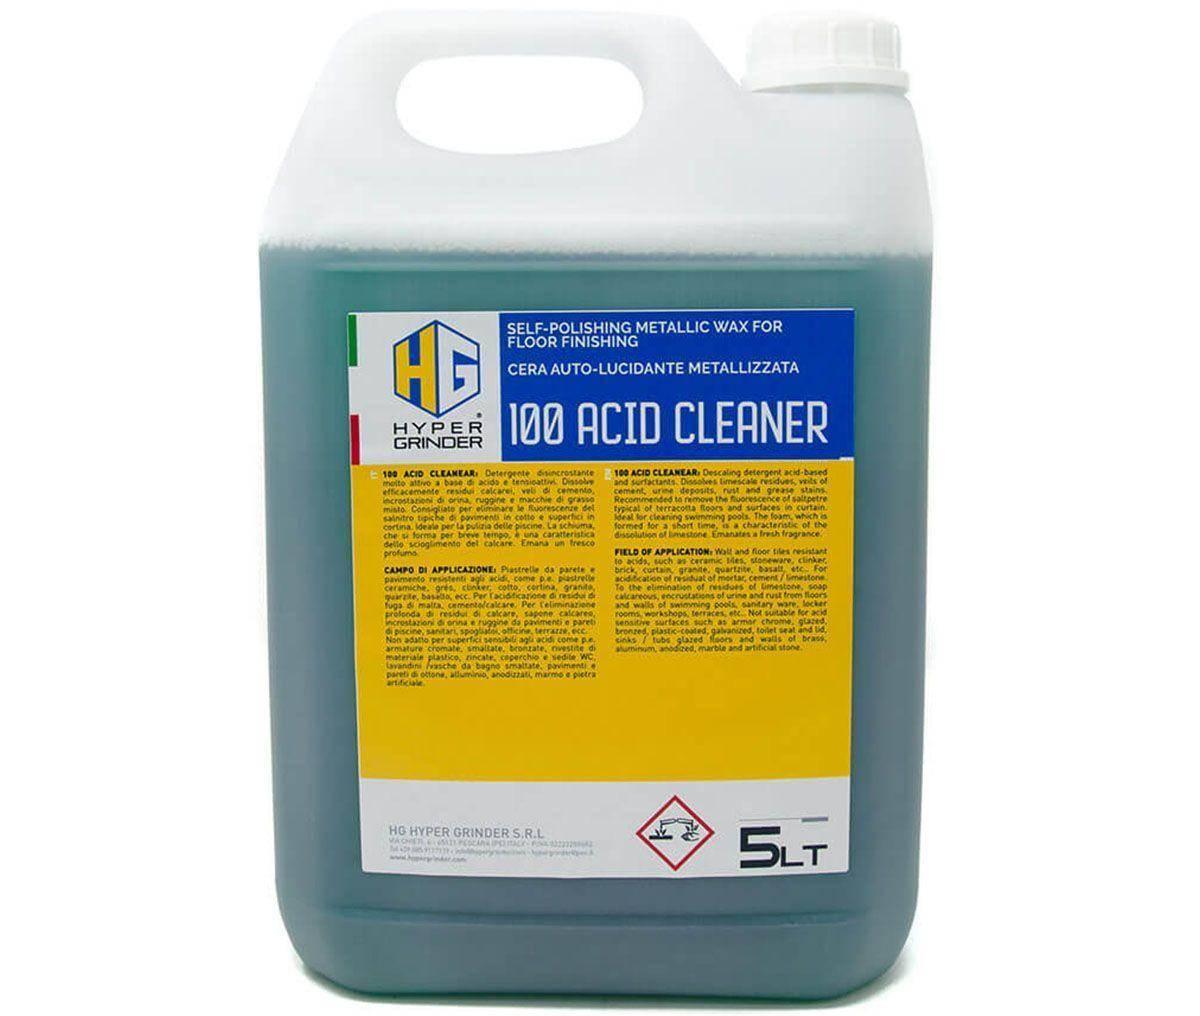 100 acid cleaner 1434